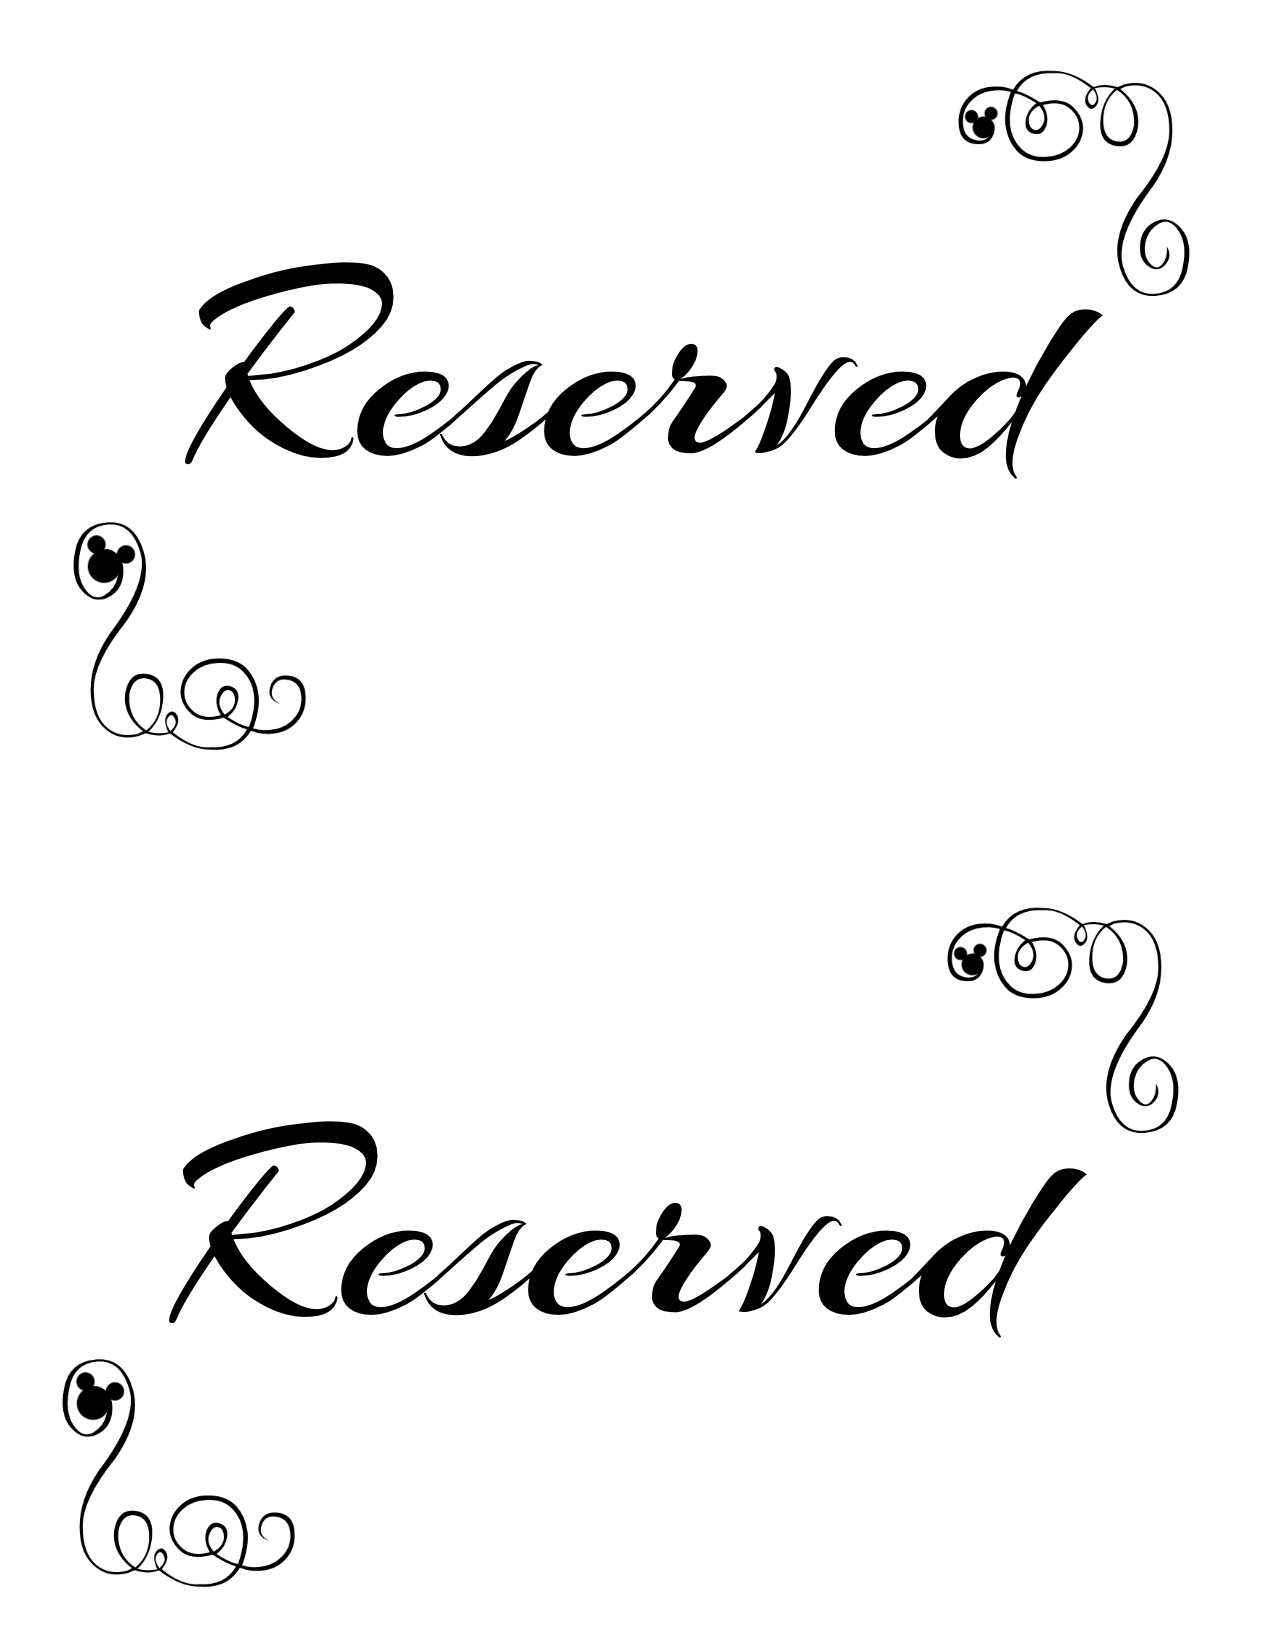 reserved sign templates Toma.daretodonate.co